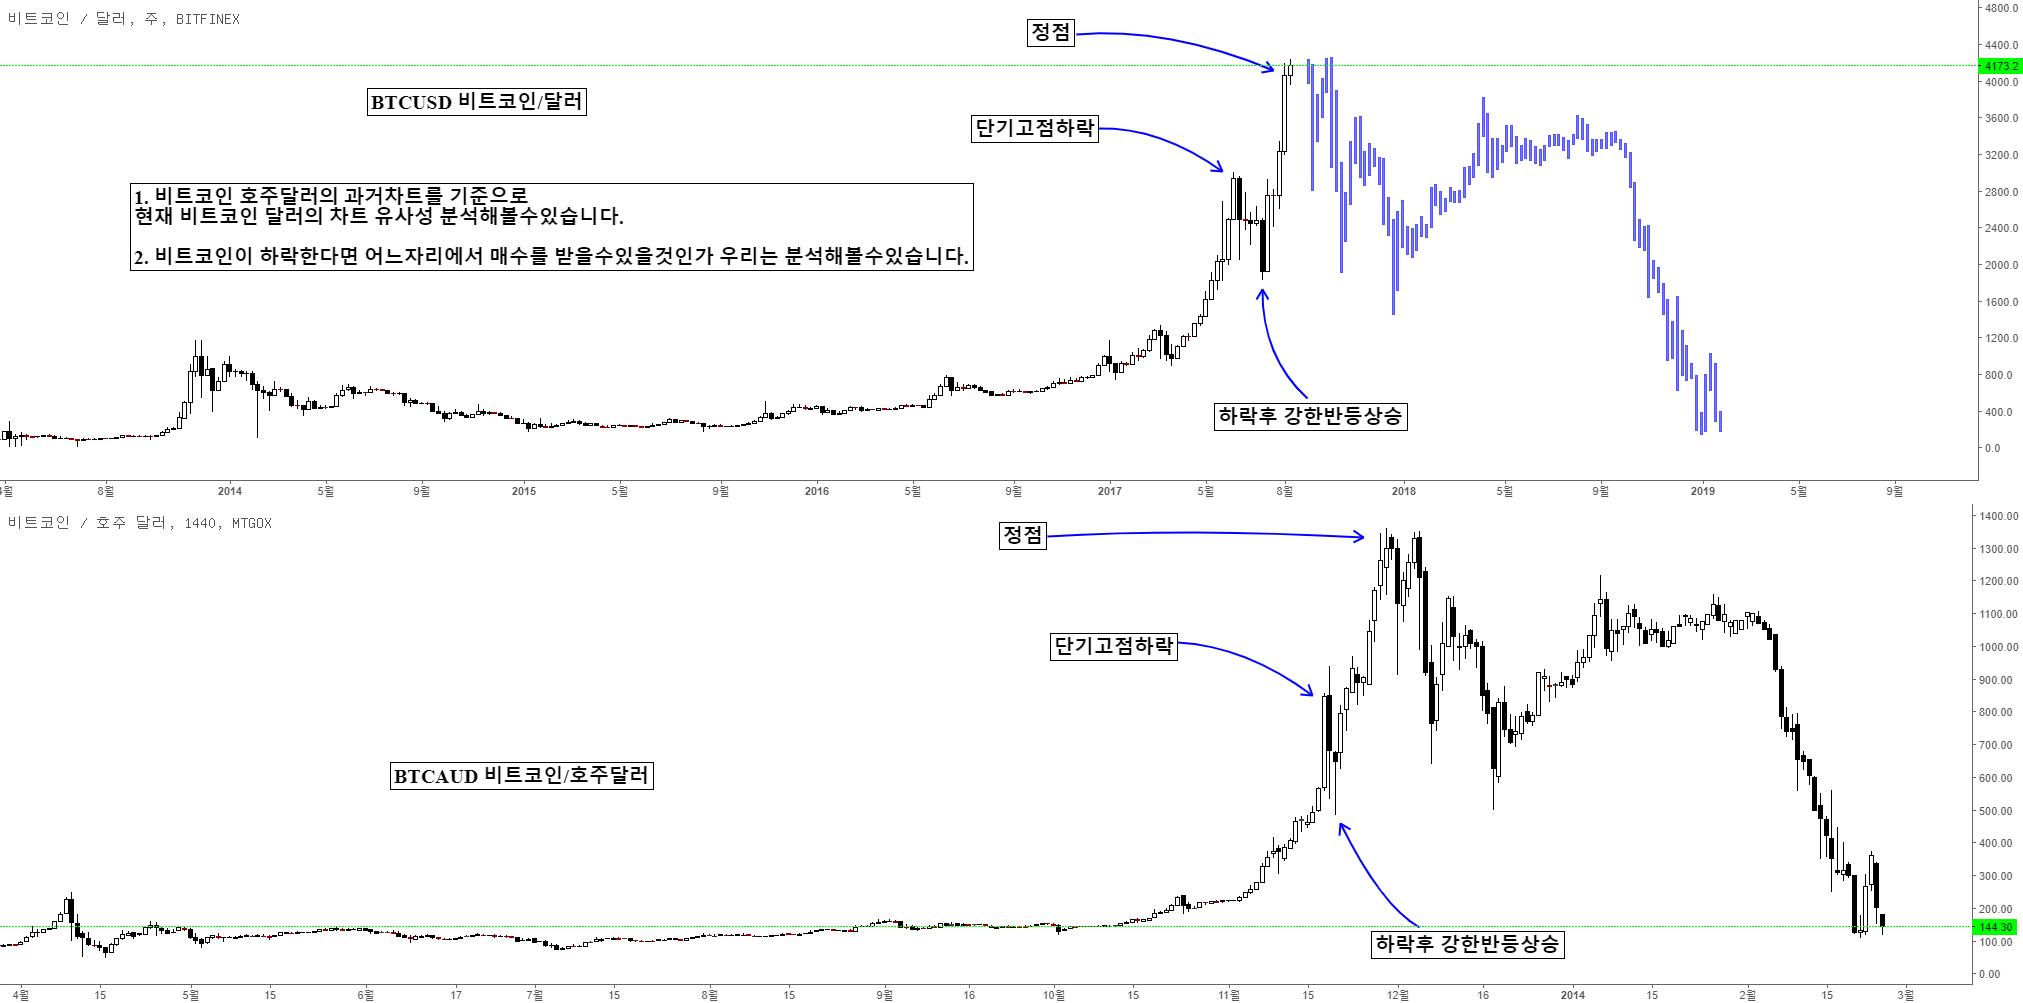 BTCUSDT/BTCUSD/BTCKRW 비트코인 과거차트와 유사성 하락에 대한 프렉탈 분석